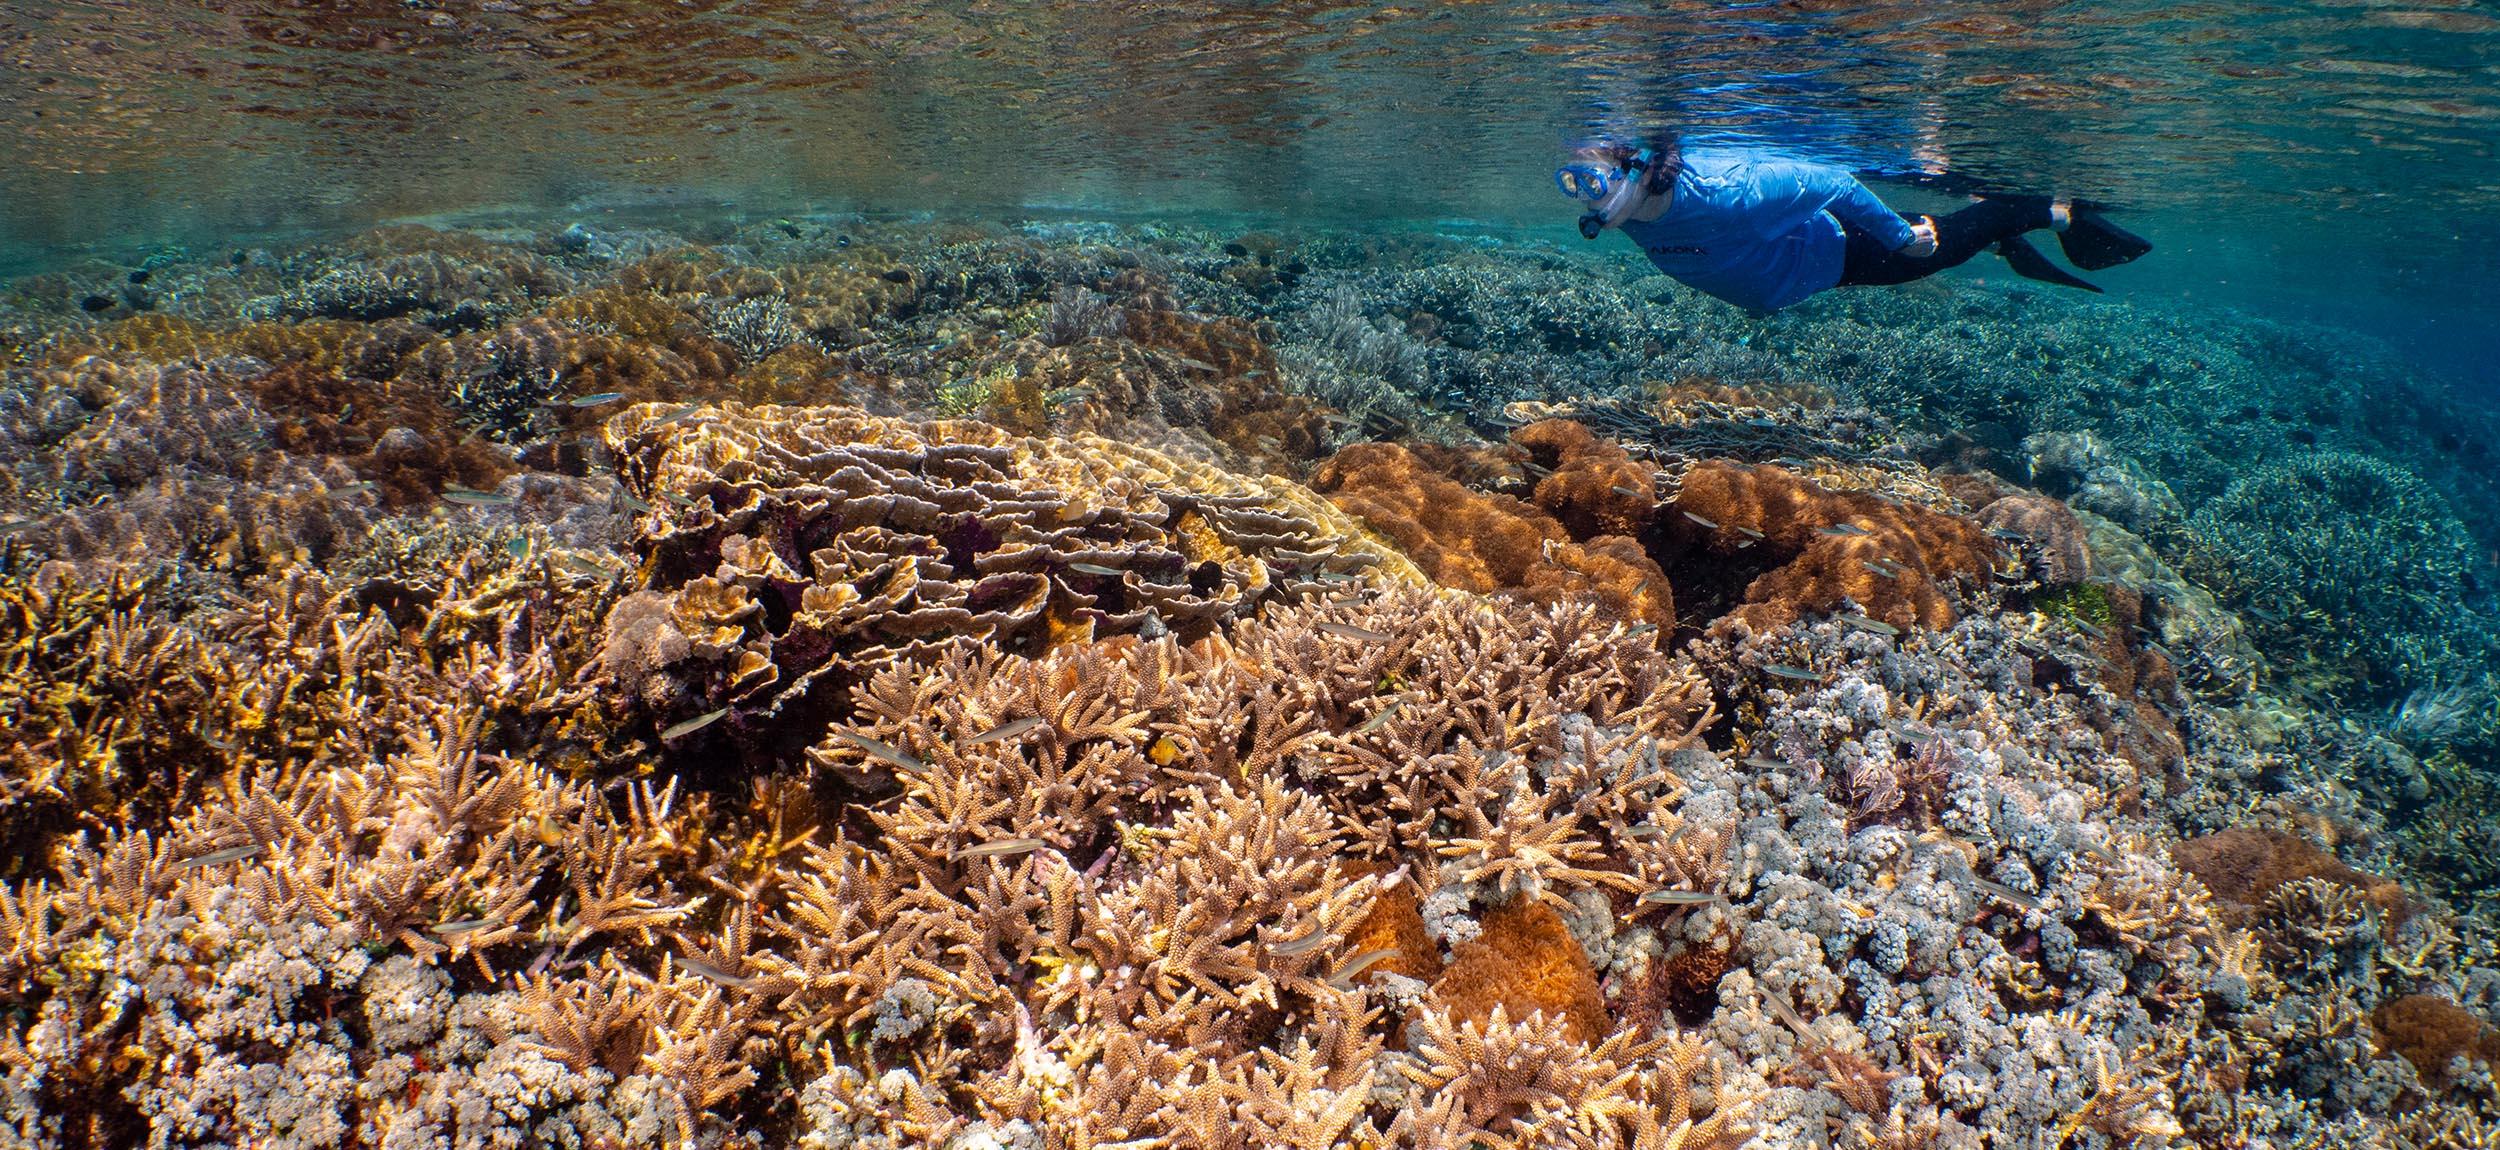 Snorkeler over hard coral reef